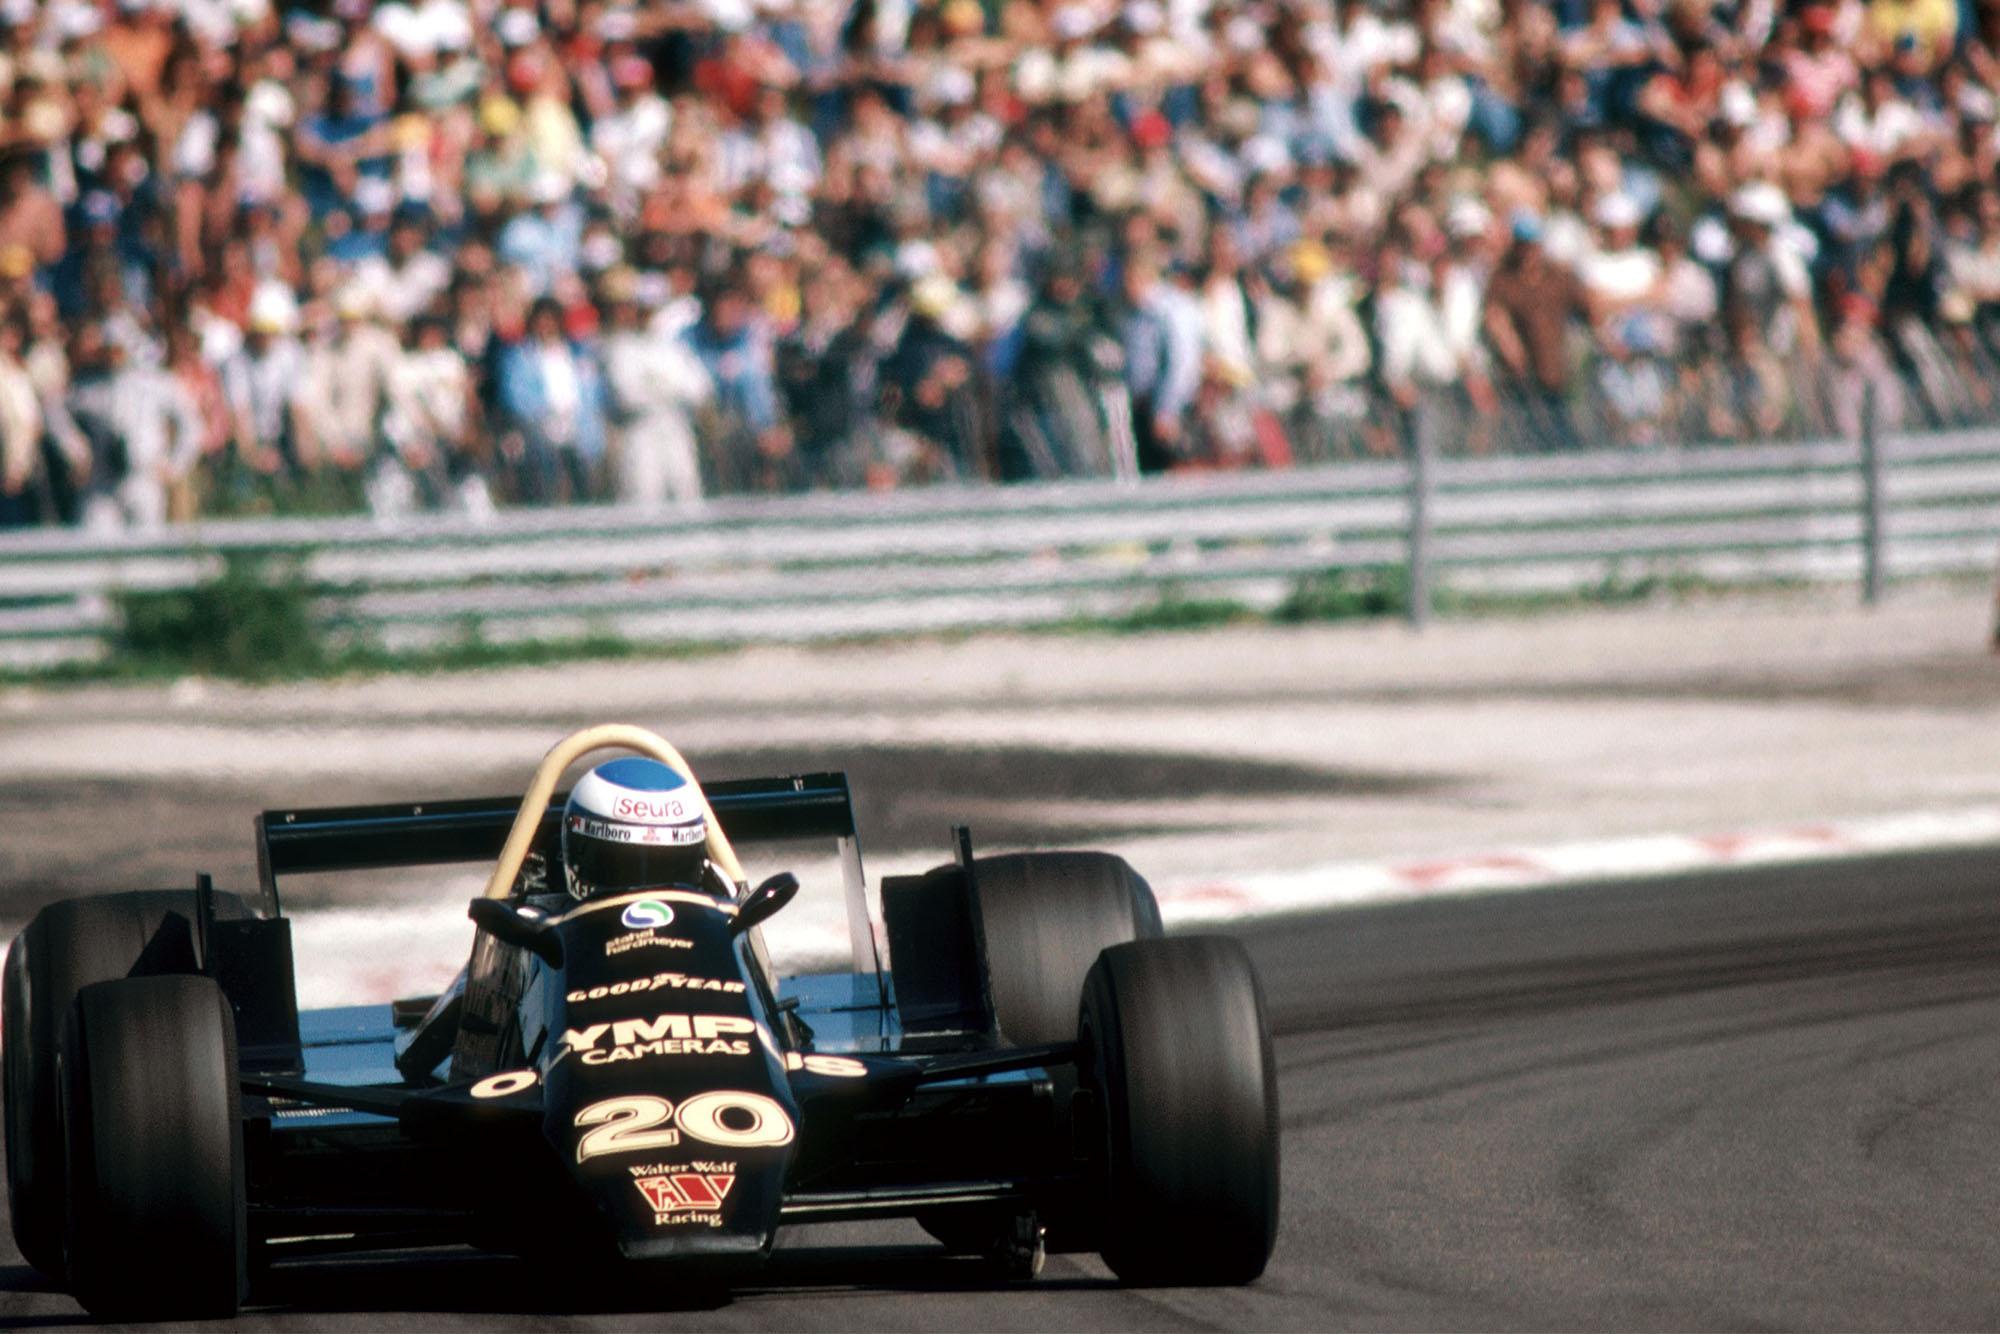 1979 French GP Rosberg